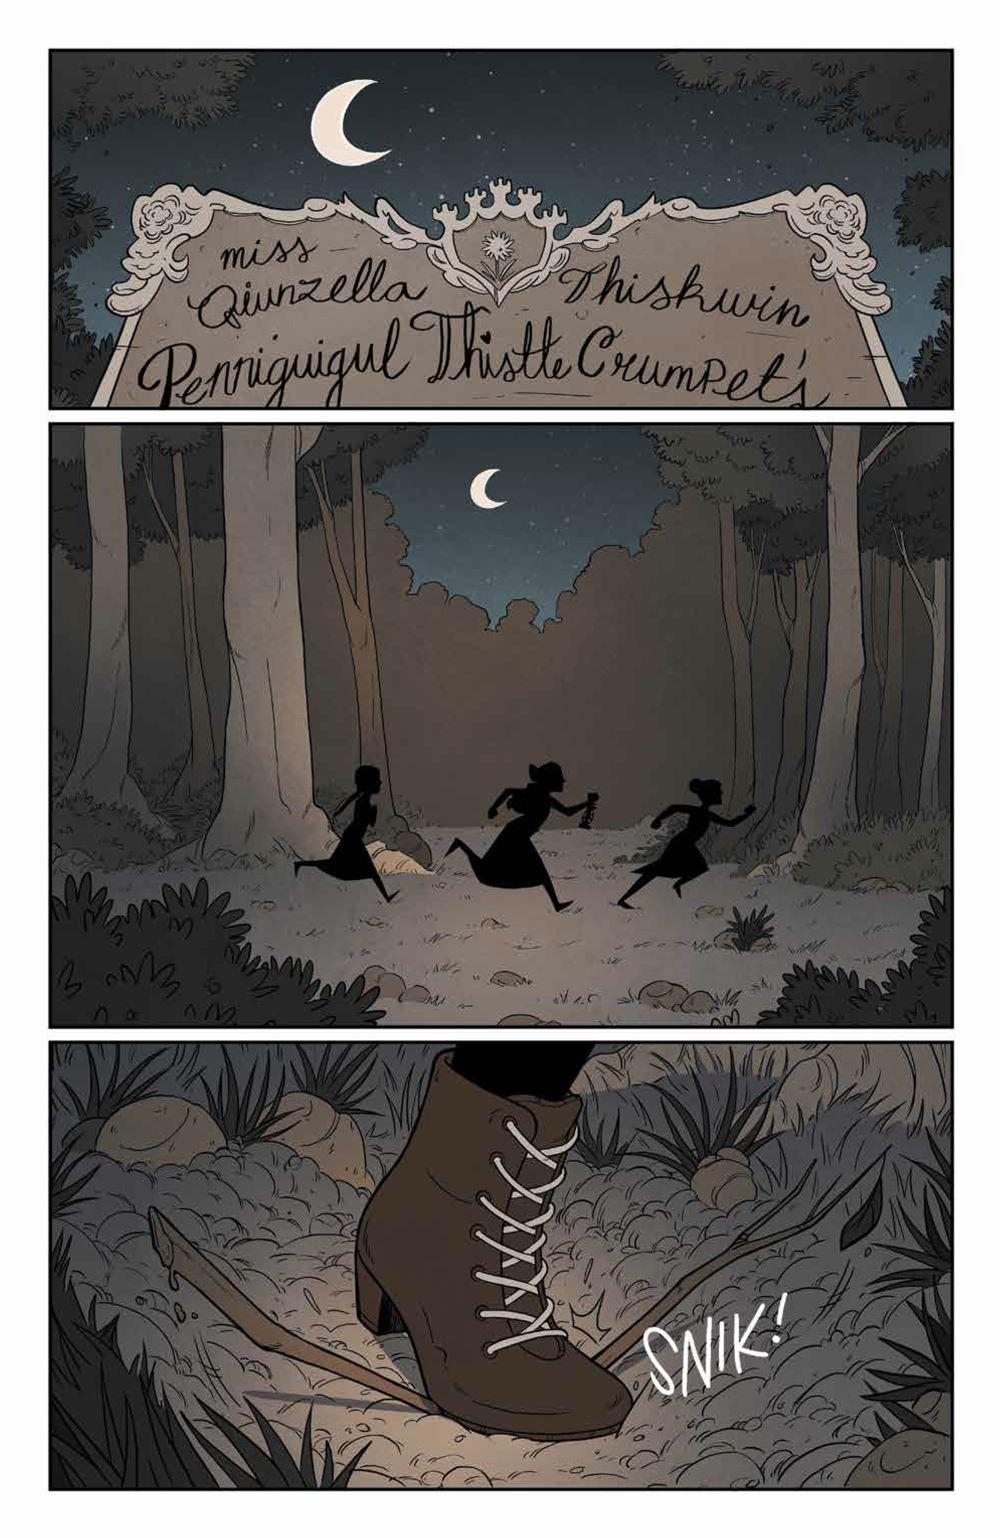 Lumberjanes_v18_SC_PRESS_9 ComicList Previews: LUMBERJANES VOLUME 18 TP